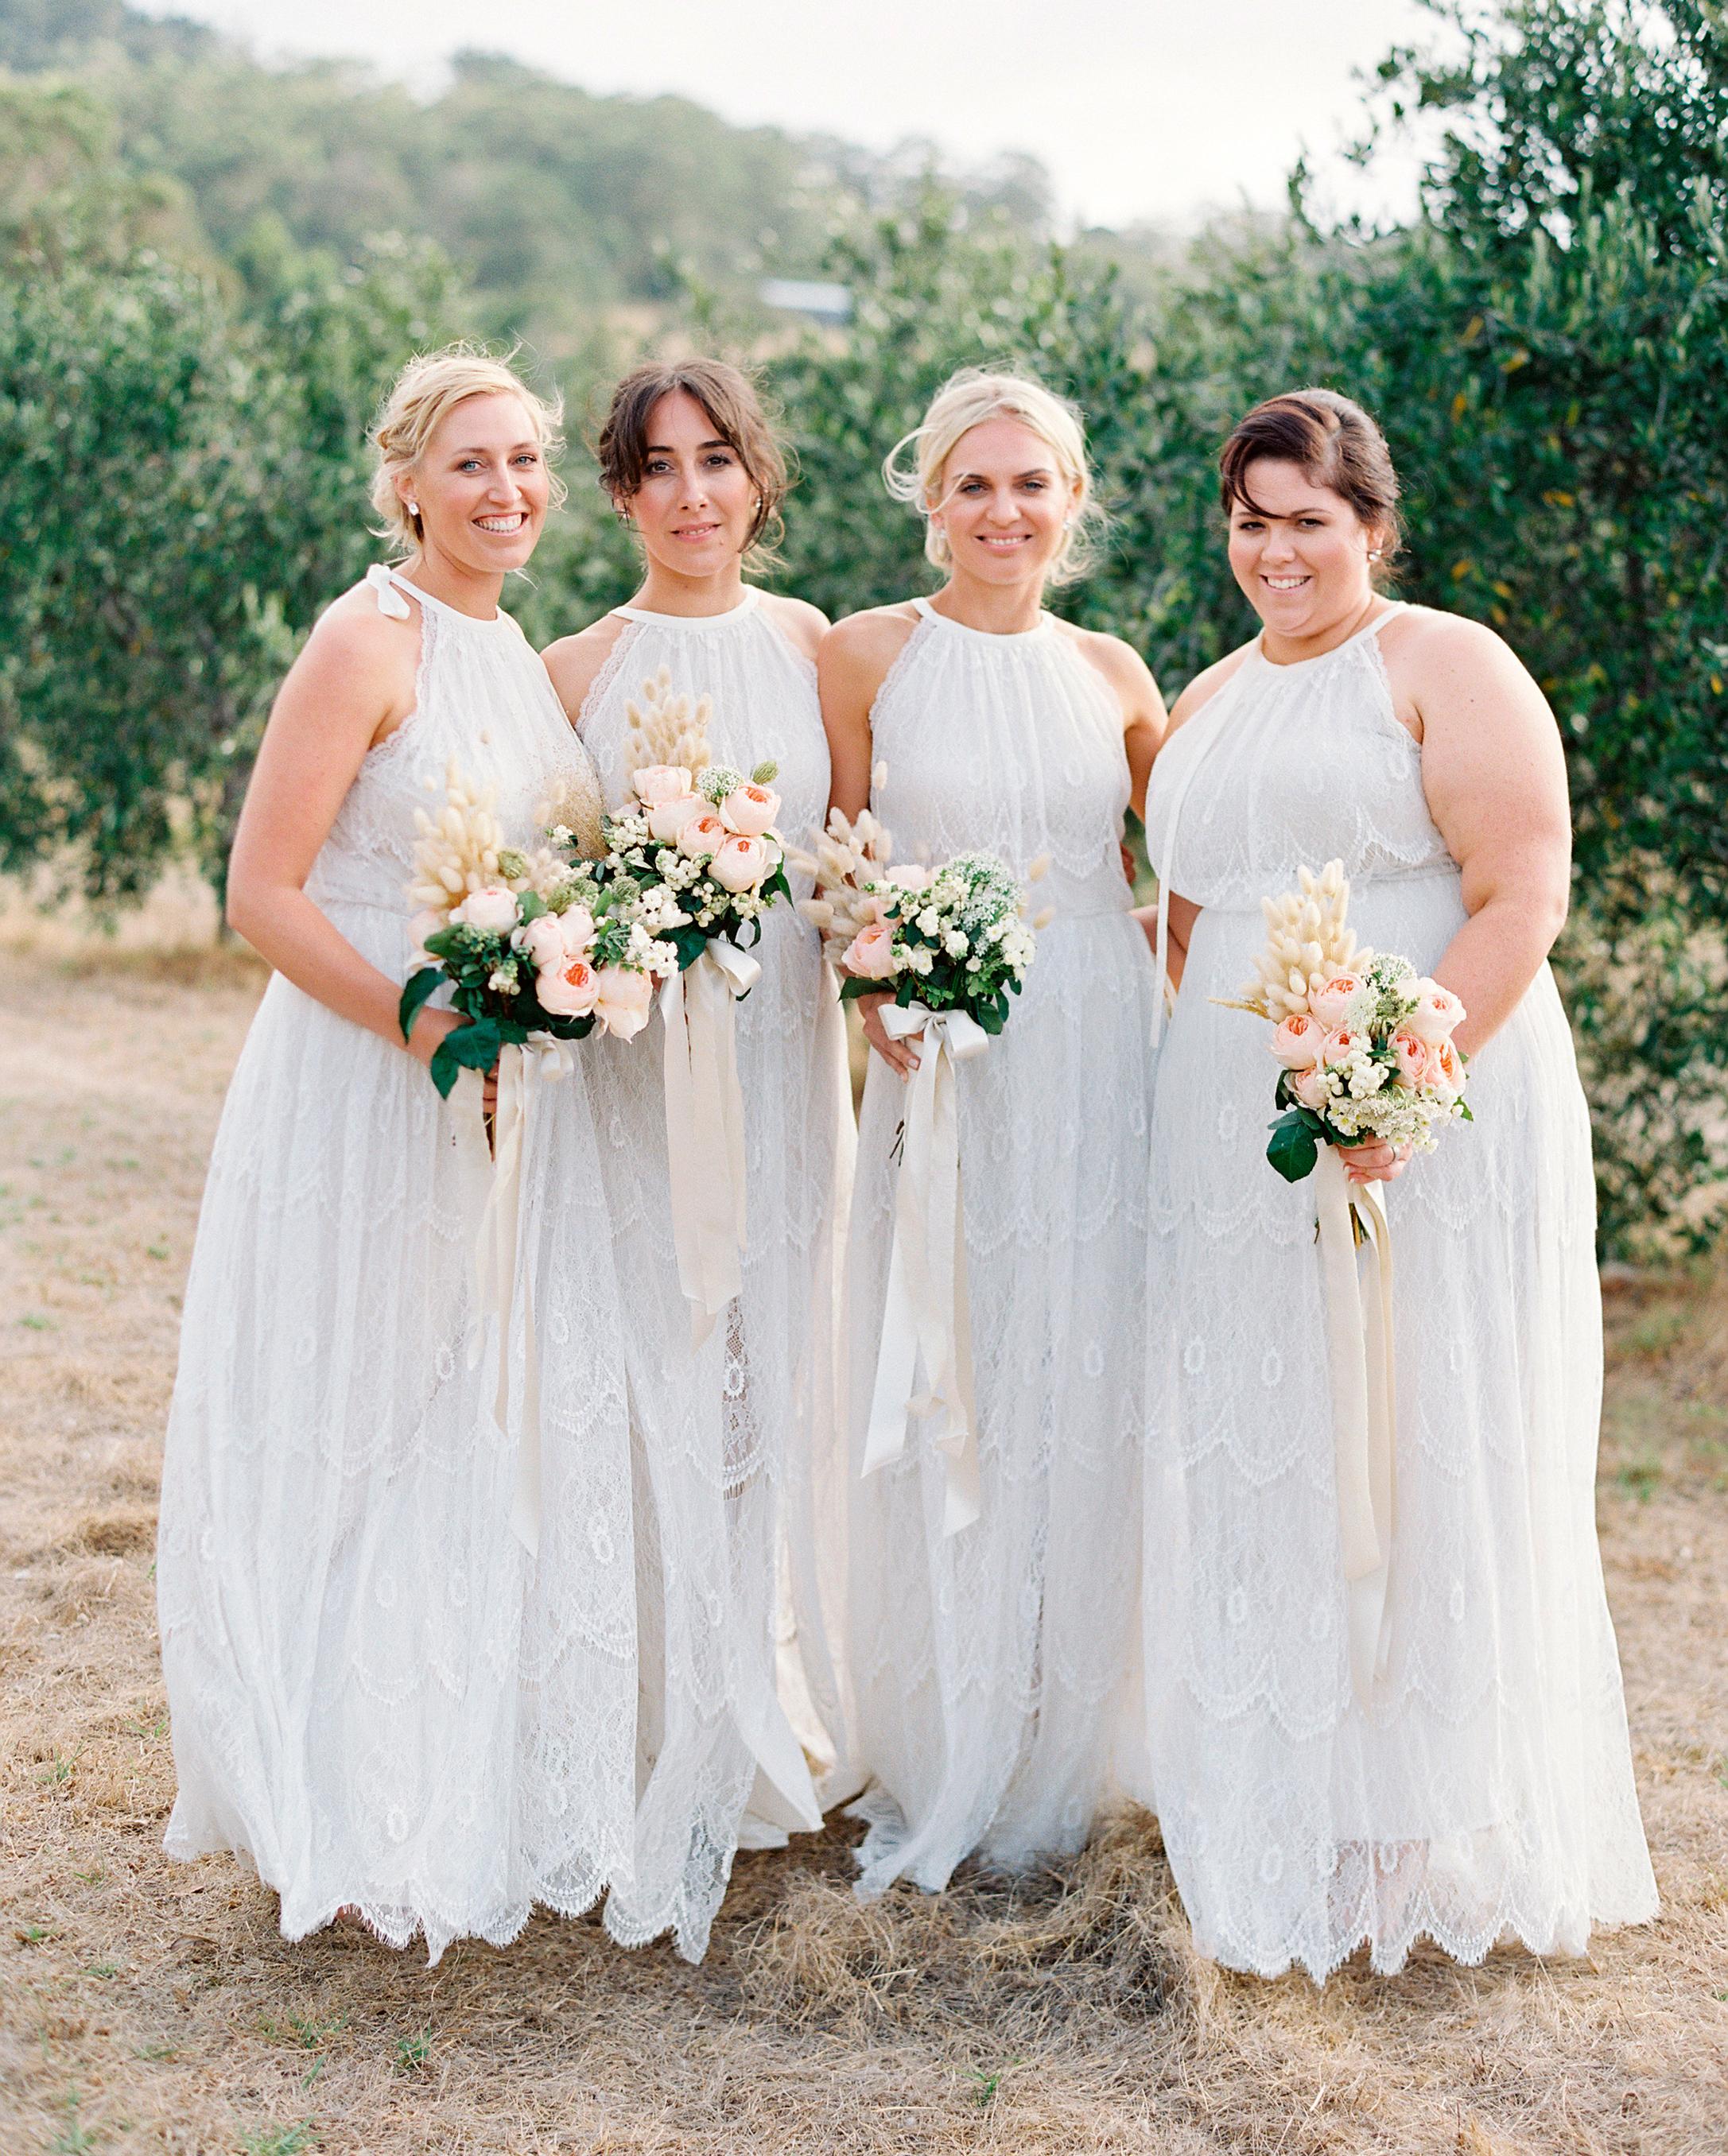 jemma-michael-wedding-bridesmaids-002568009-s112110-0815.jpg